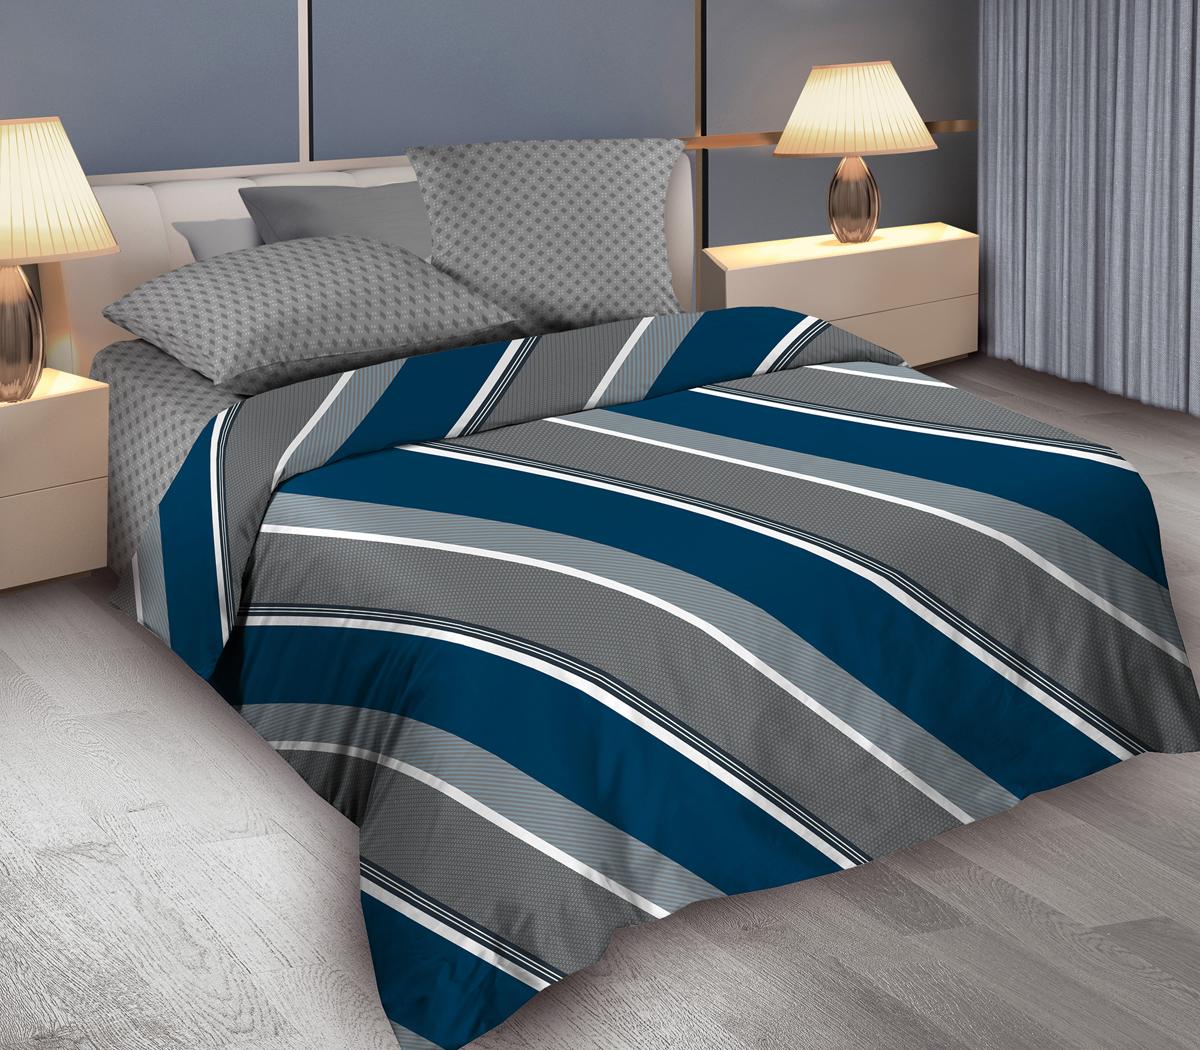 Комплект белья Wenge Gentle, евро, наволочки 70x70, цвет: серый364989